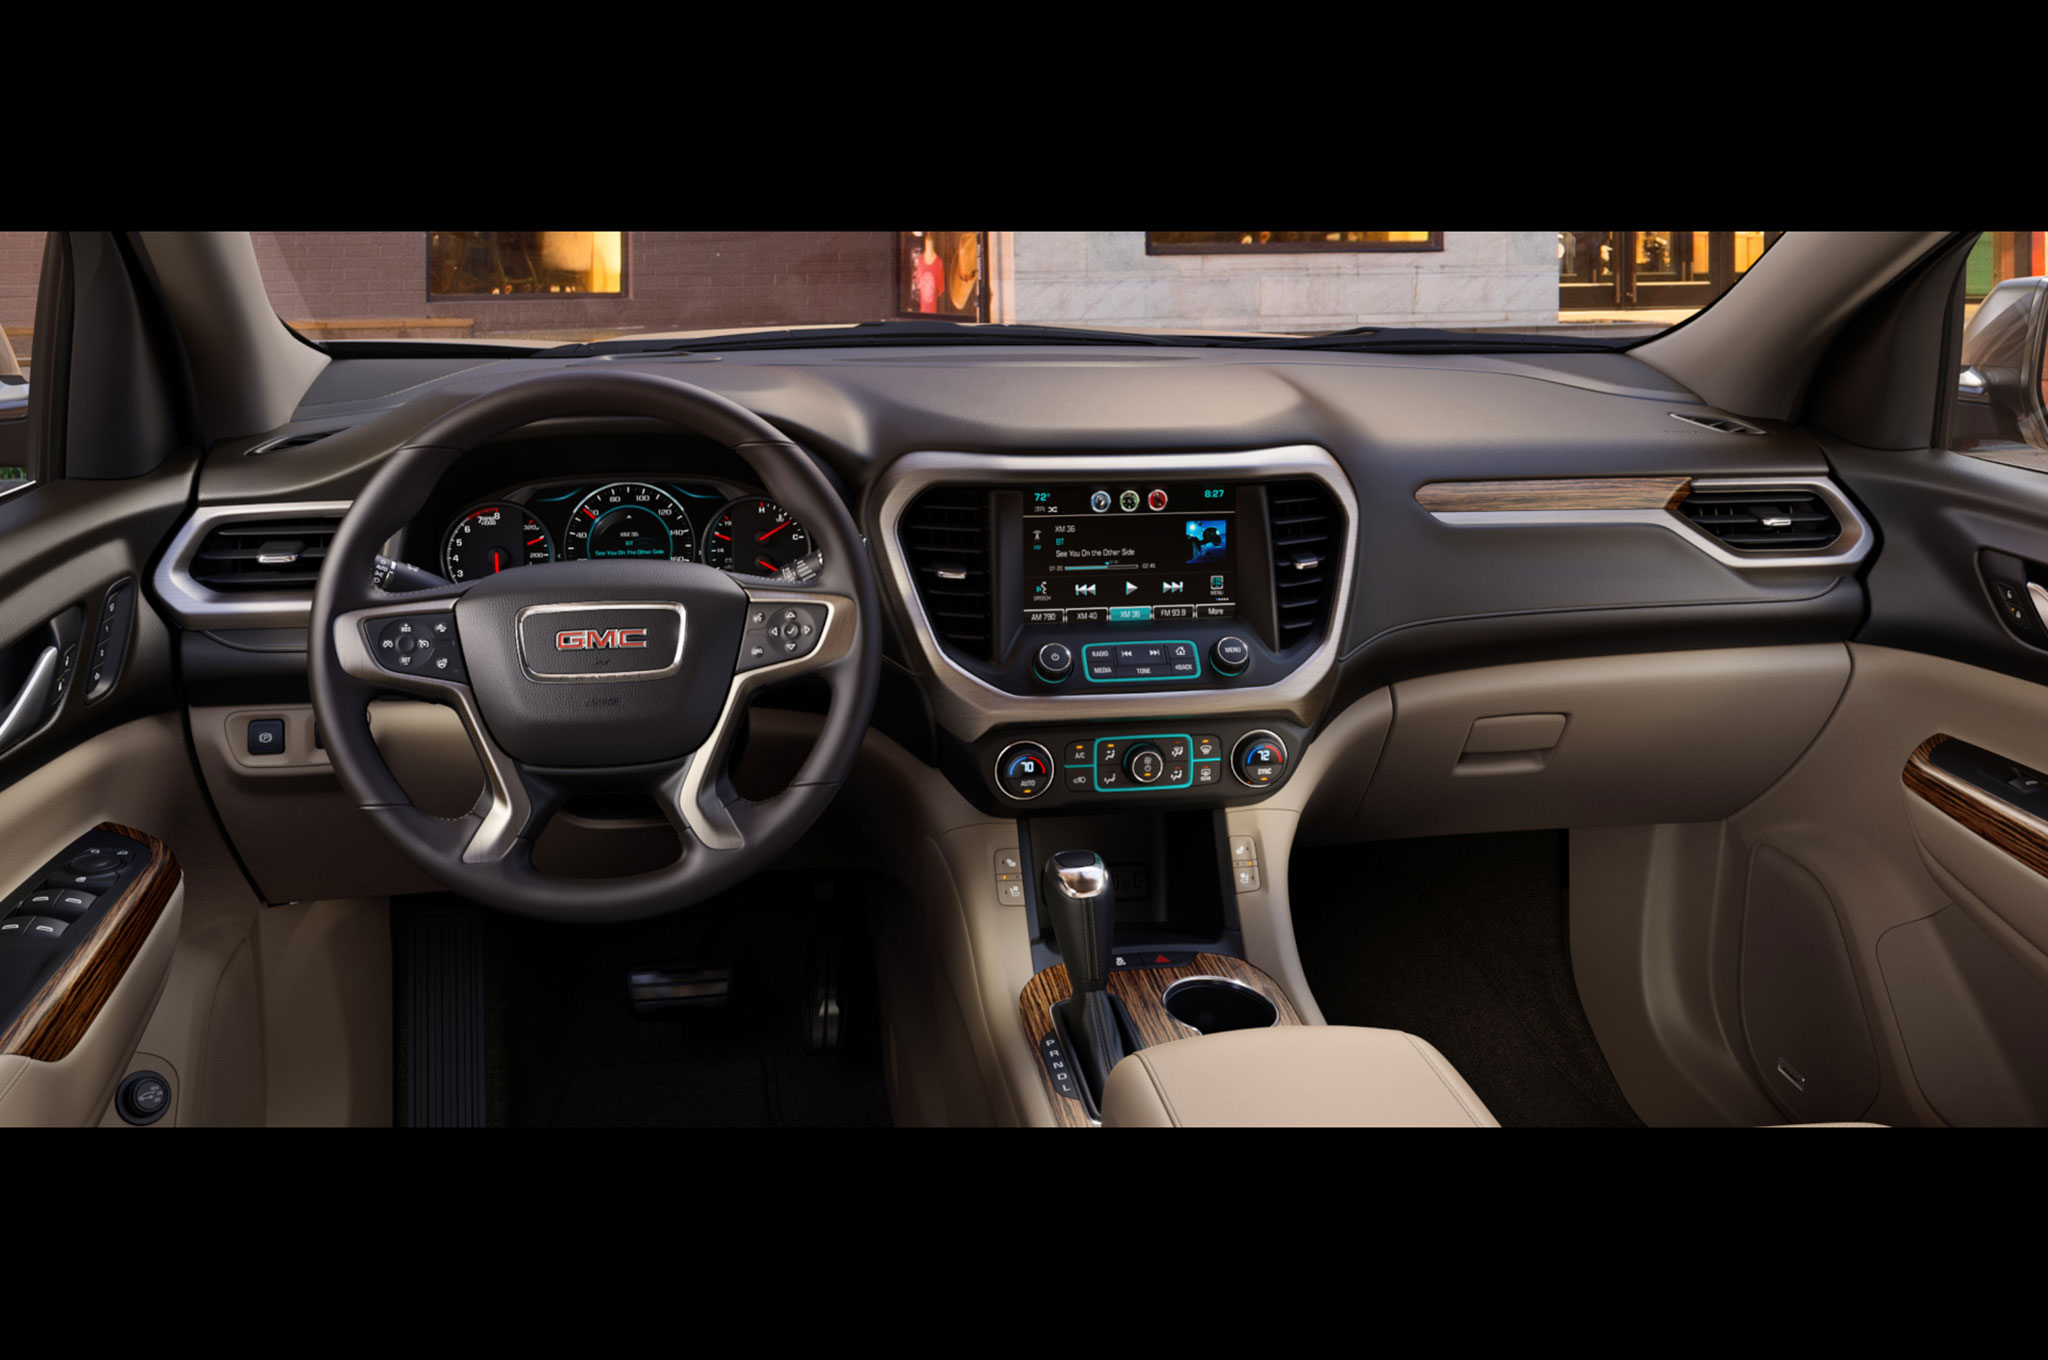 2014 gmc acadia interior. show more 2014 gmc acadia interior